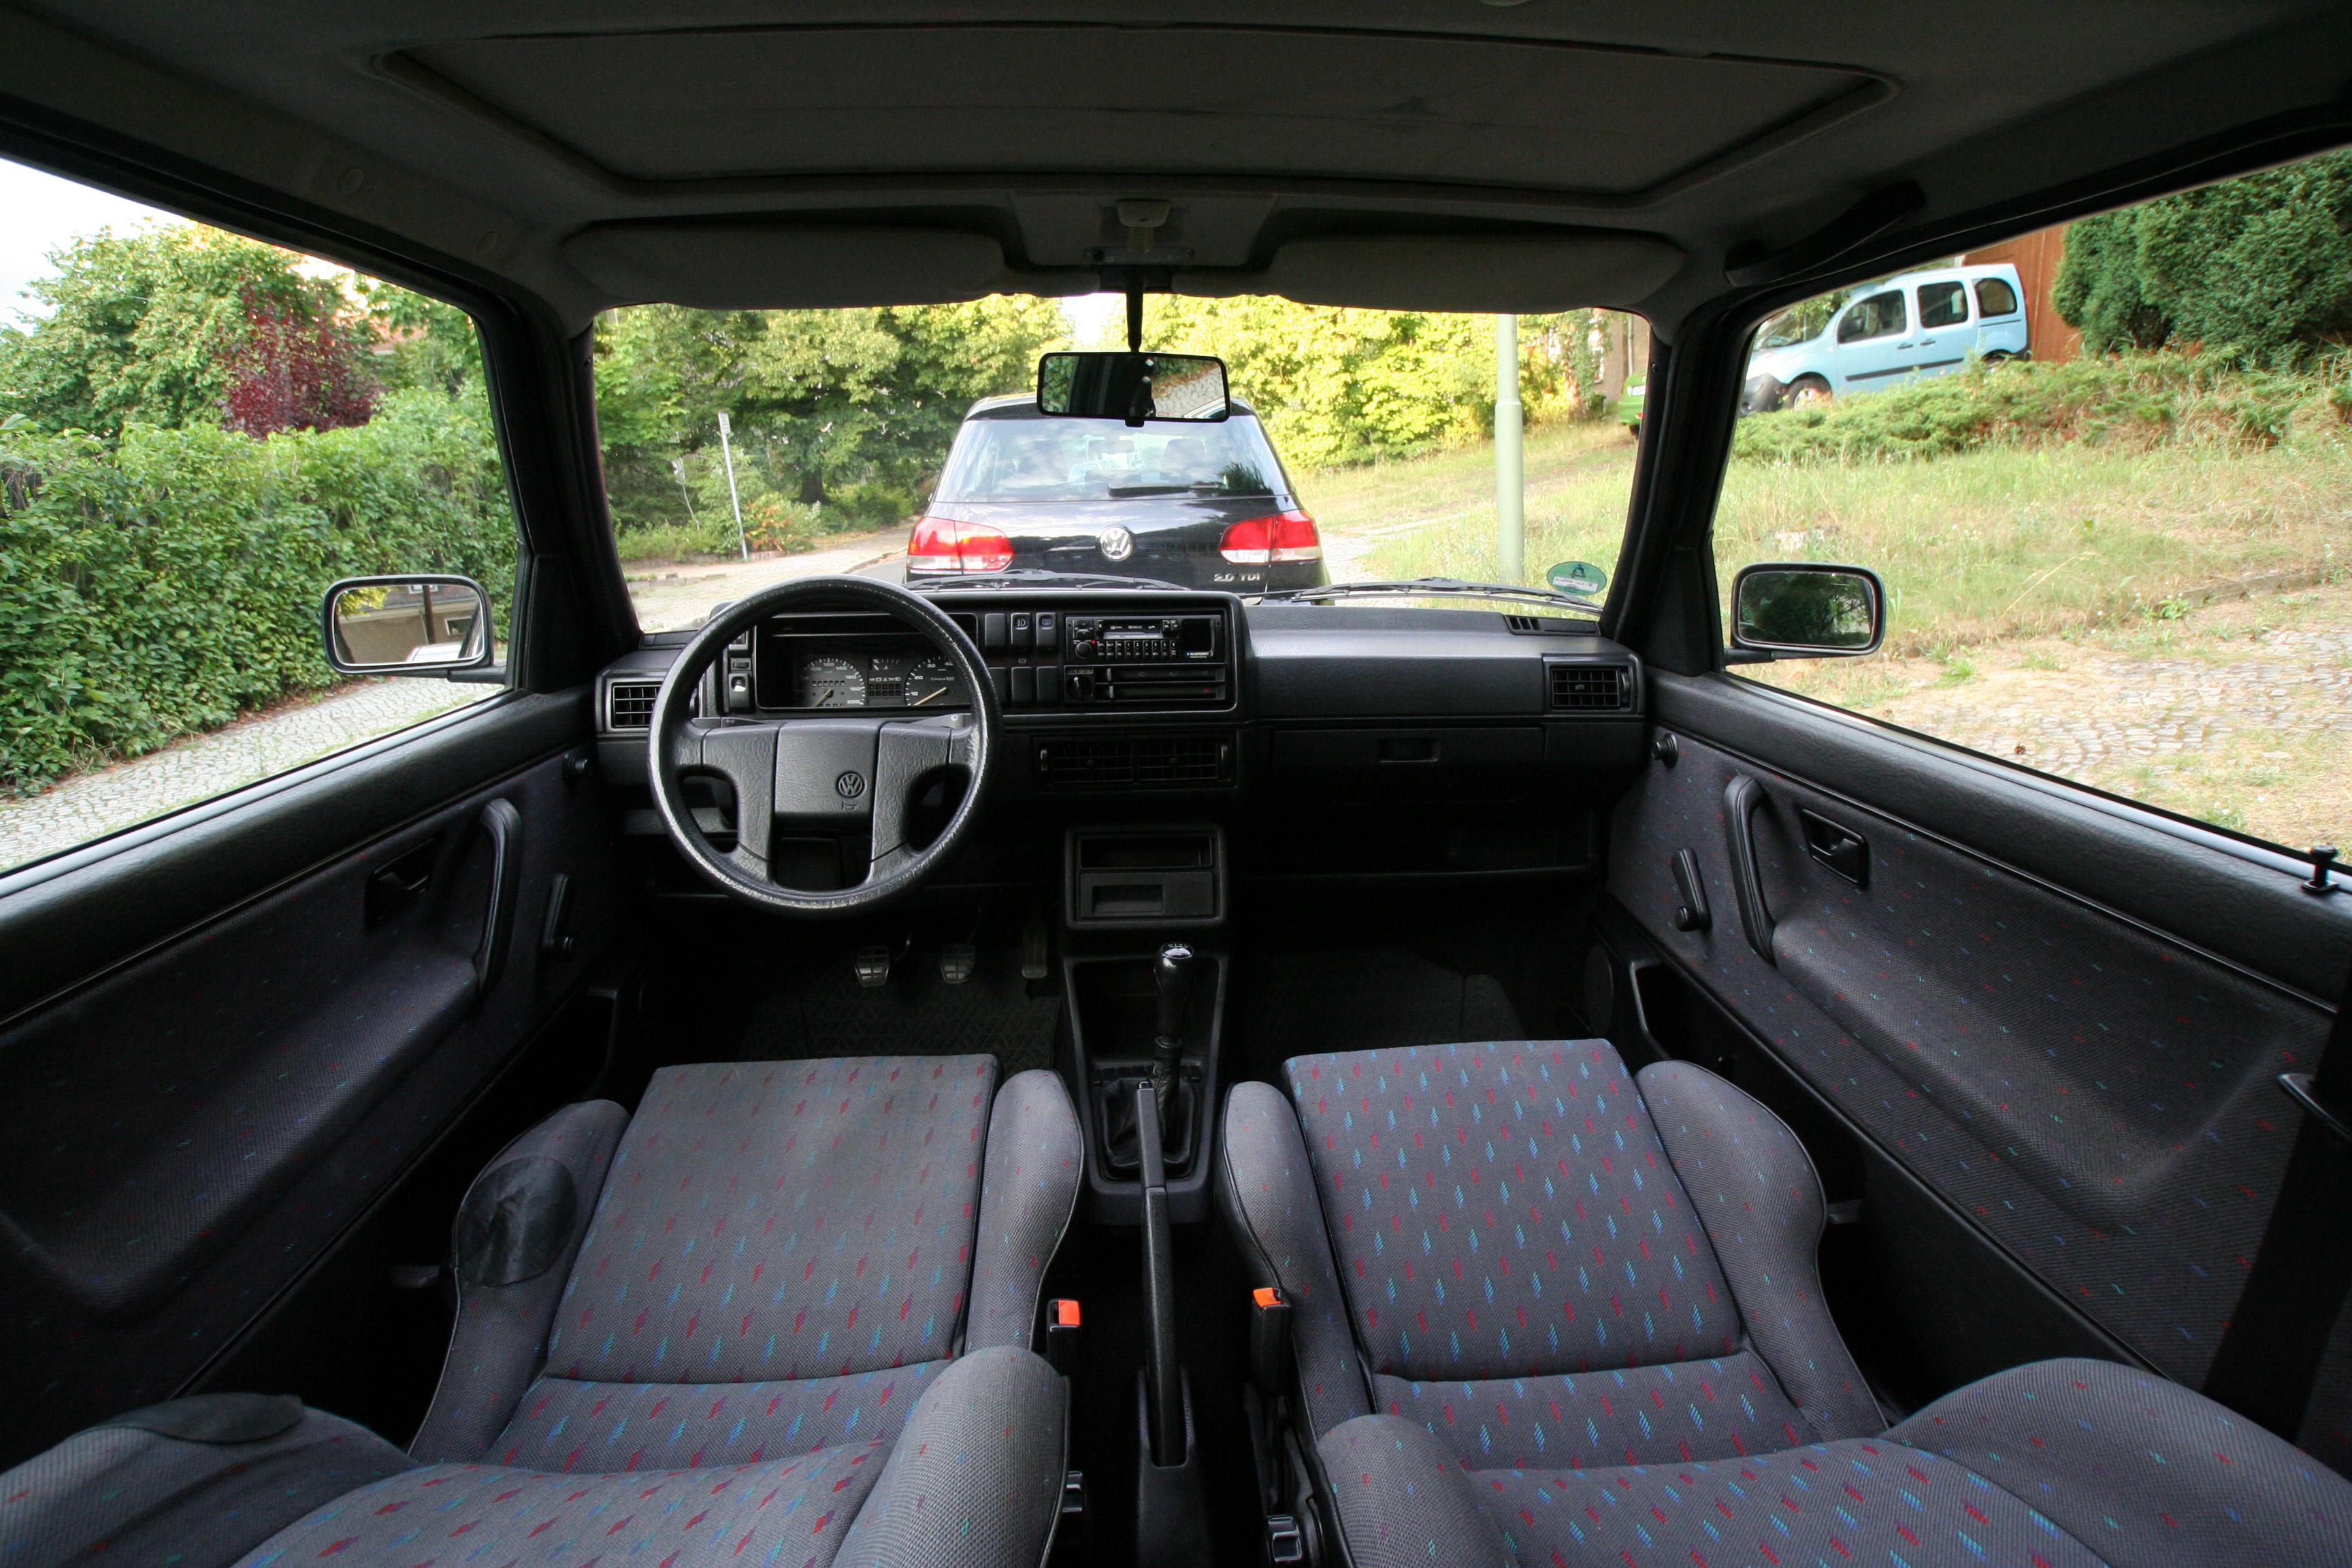 File:VW Golf II 1.6 Pasadena 1991, interior.JPG - Wikimedia Commons